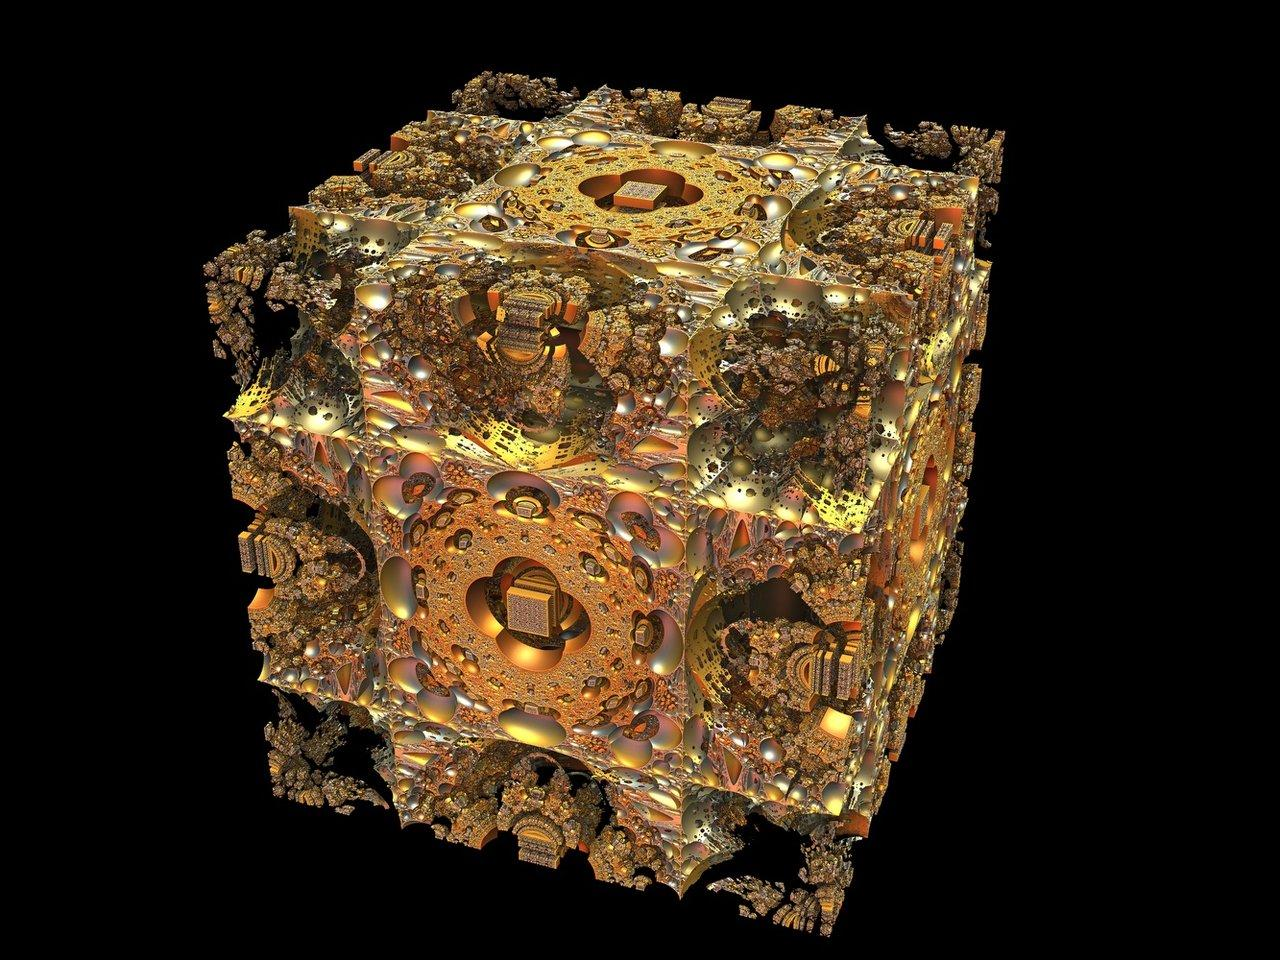 Resultados da Pesquisa de imagens do Google para http://fc08.deviantart.net/fs70/i/2010/187/4/8/First_True_Mandelbox_by_PersistentAura.jpg